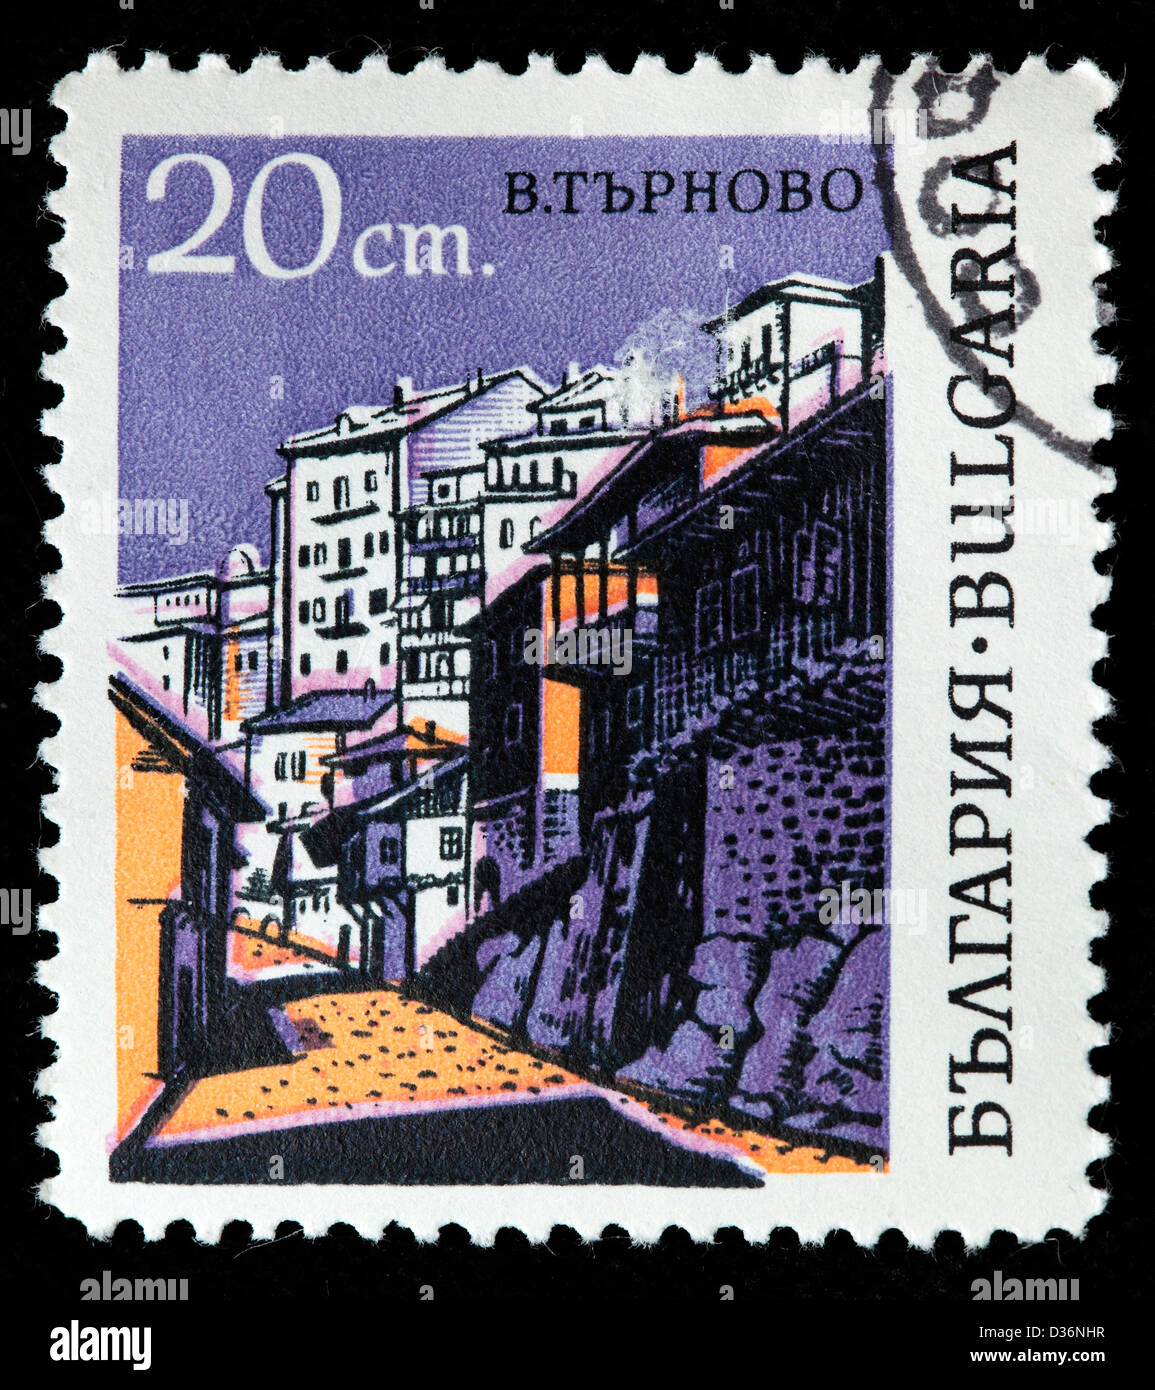 Veliko Tarnovo city, postage stamp, Bulgaria Stock Photo